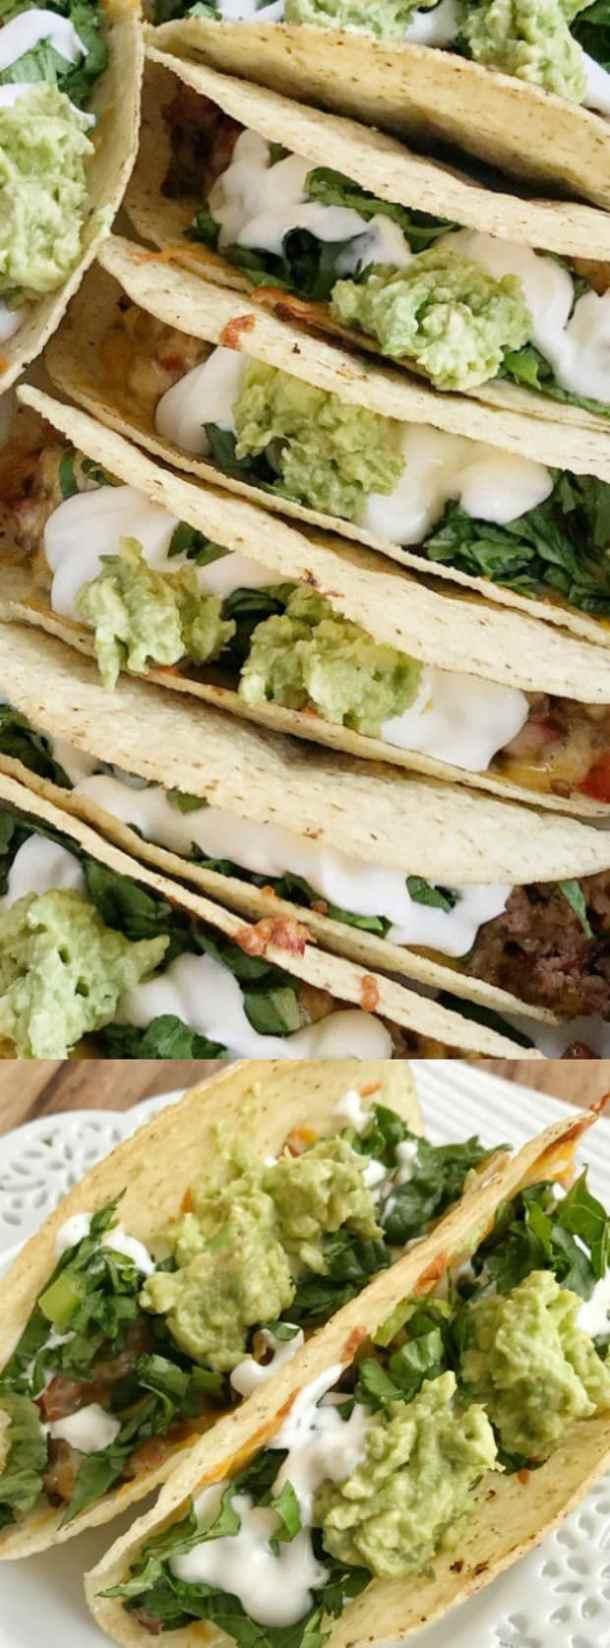 Baked Beef Fajita Tacos Longpin